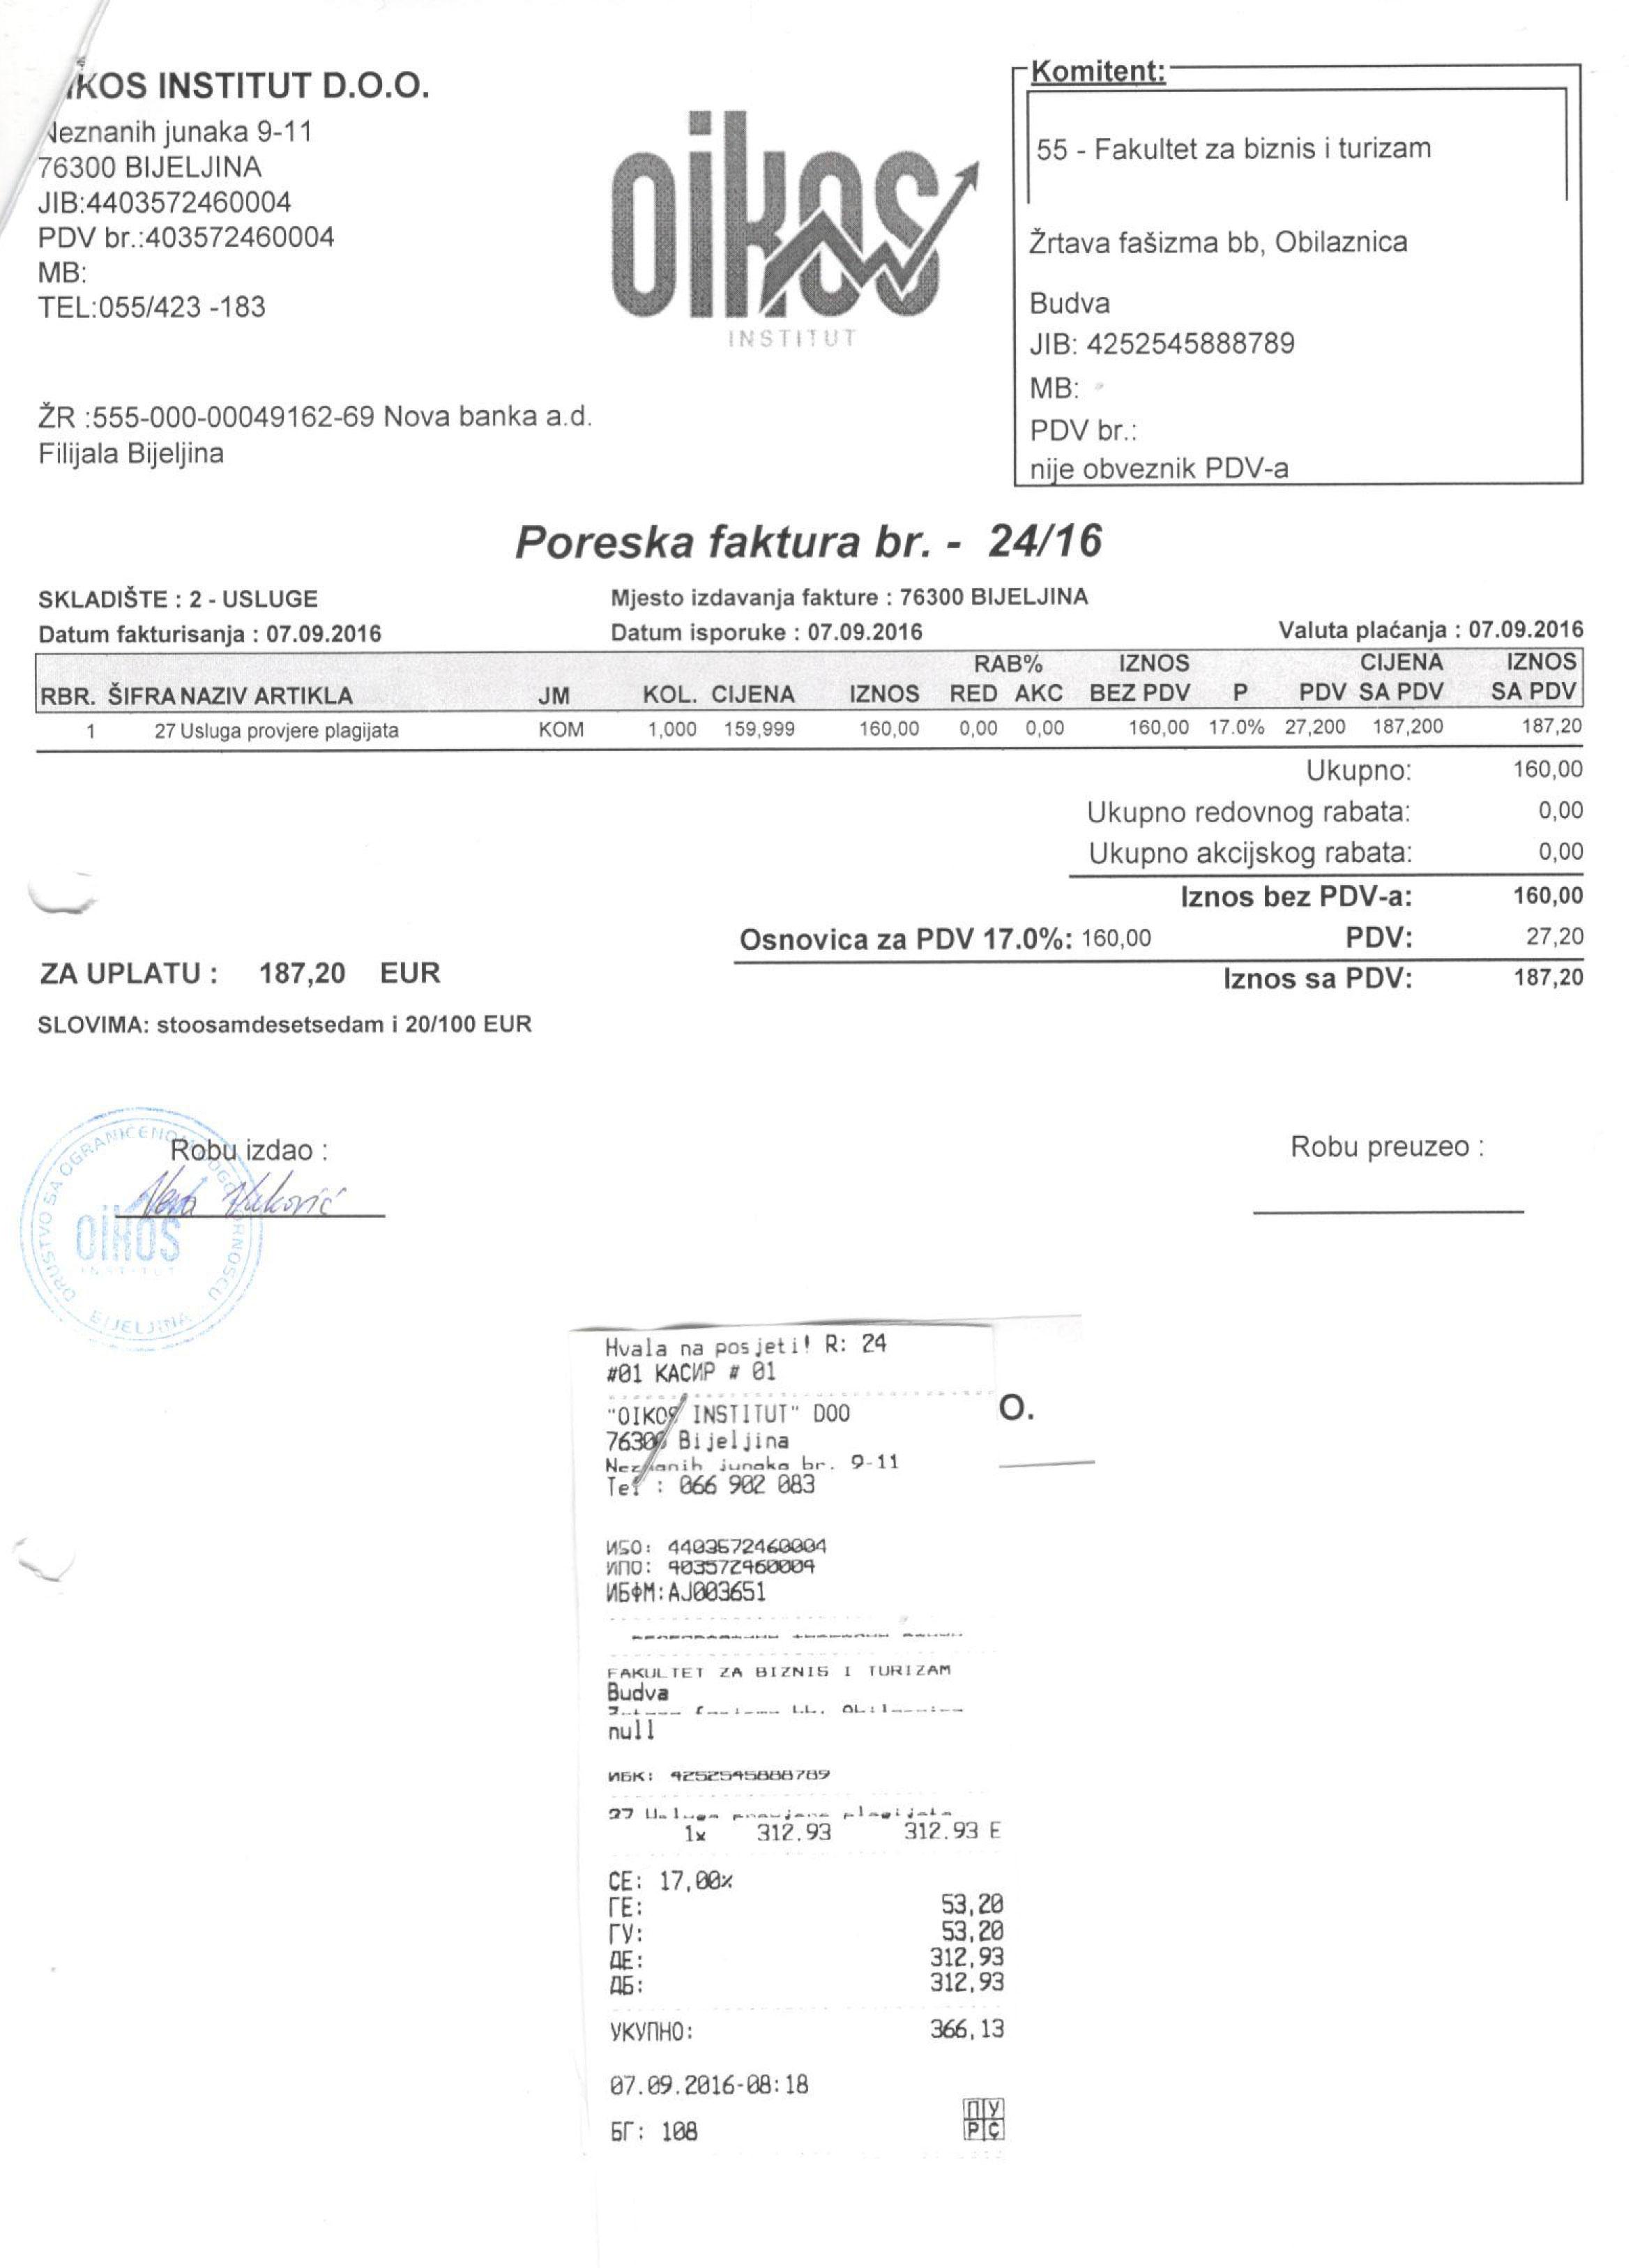 antiplagijat-test-faktura-i-racun-1